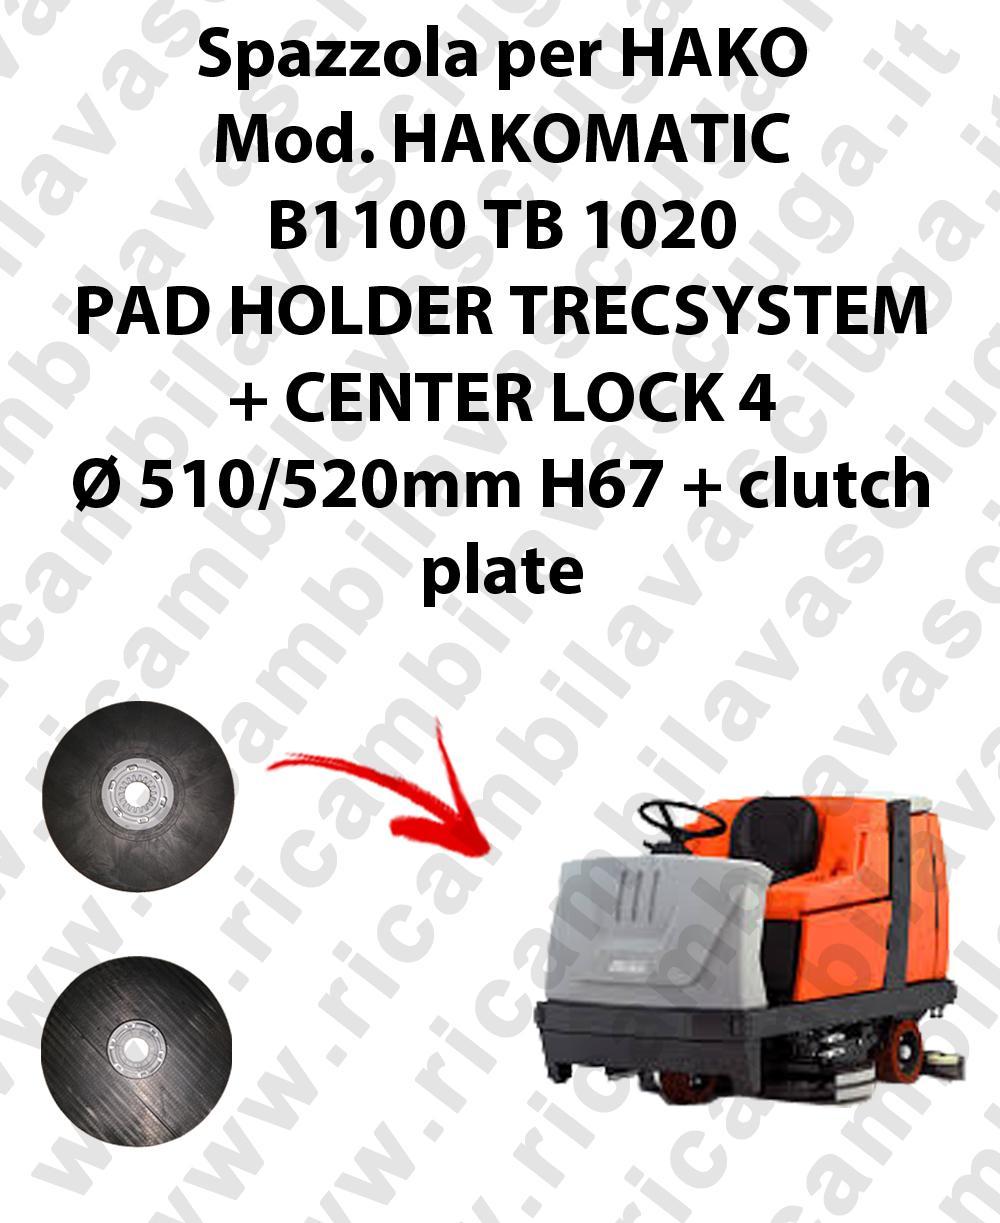 PAD HOLDER TRECSYSTEM  for scrubber dryer HAKO Model HAKOMATIC B1100 TB 1020